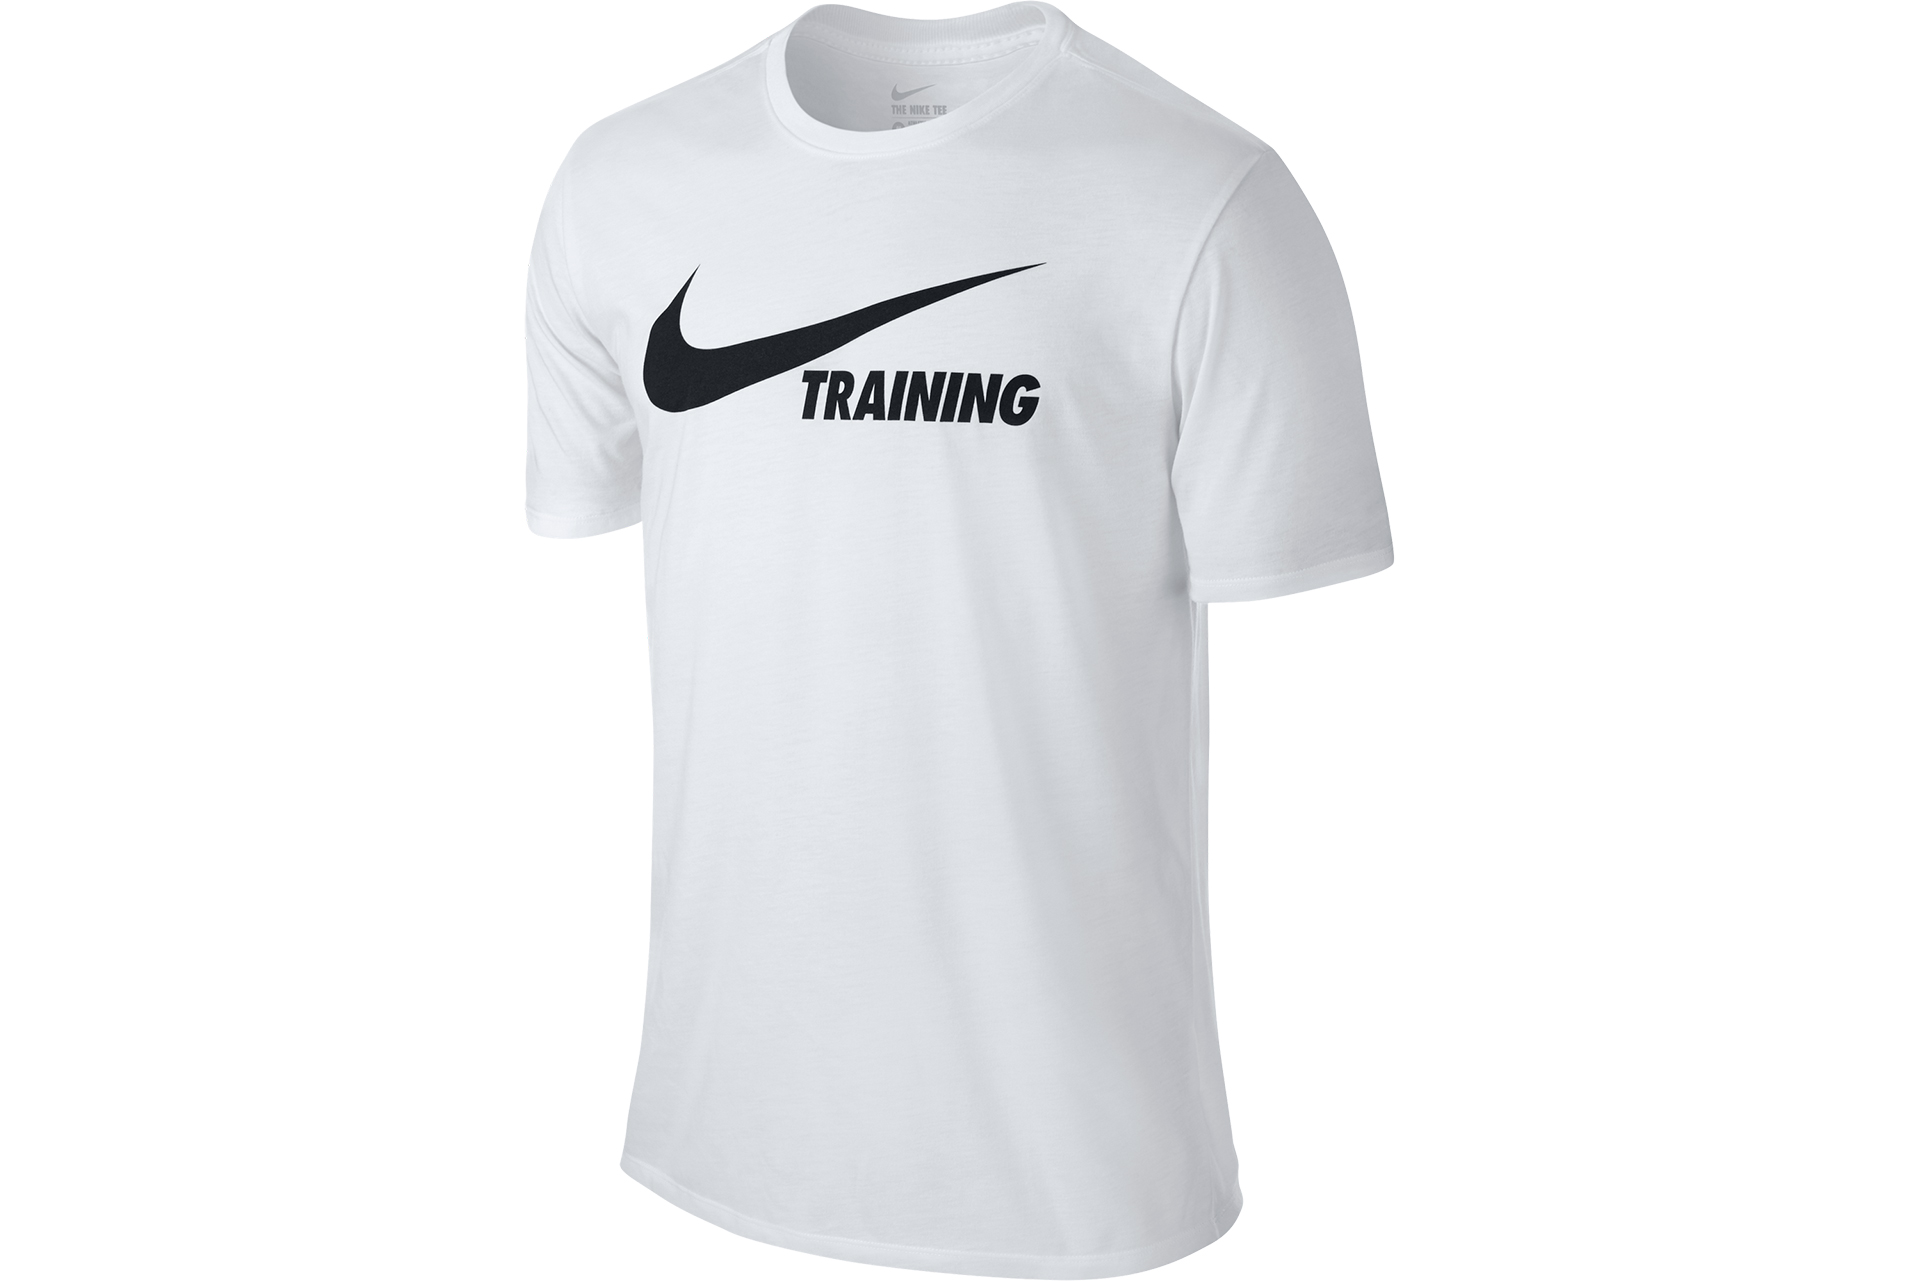 nike swoosh shirt white